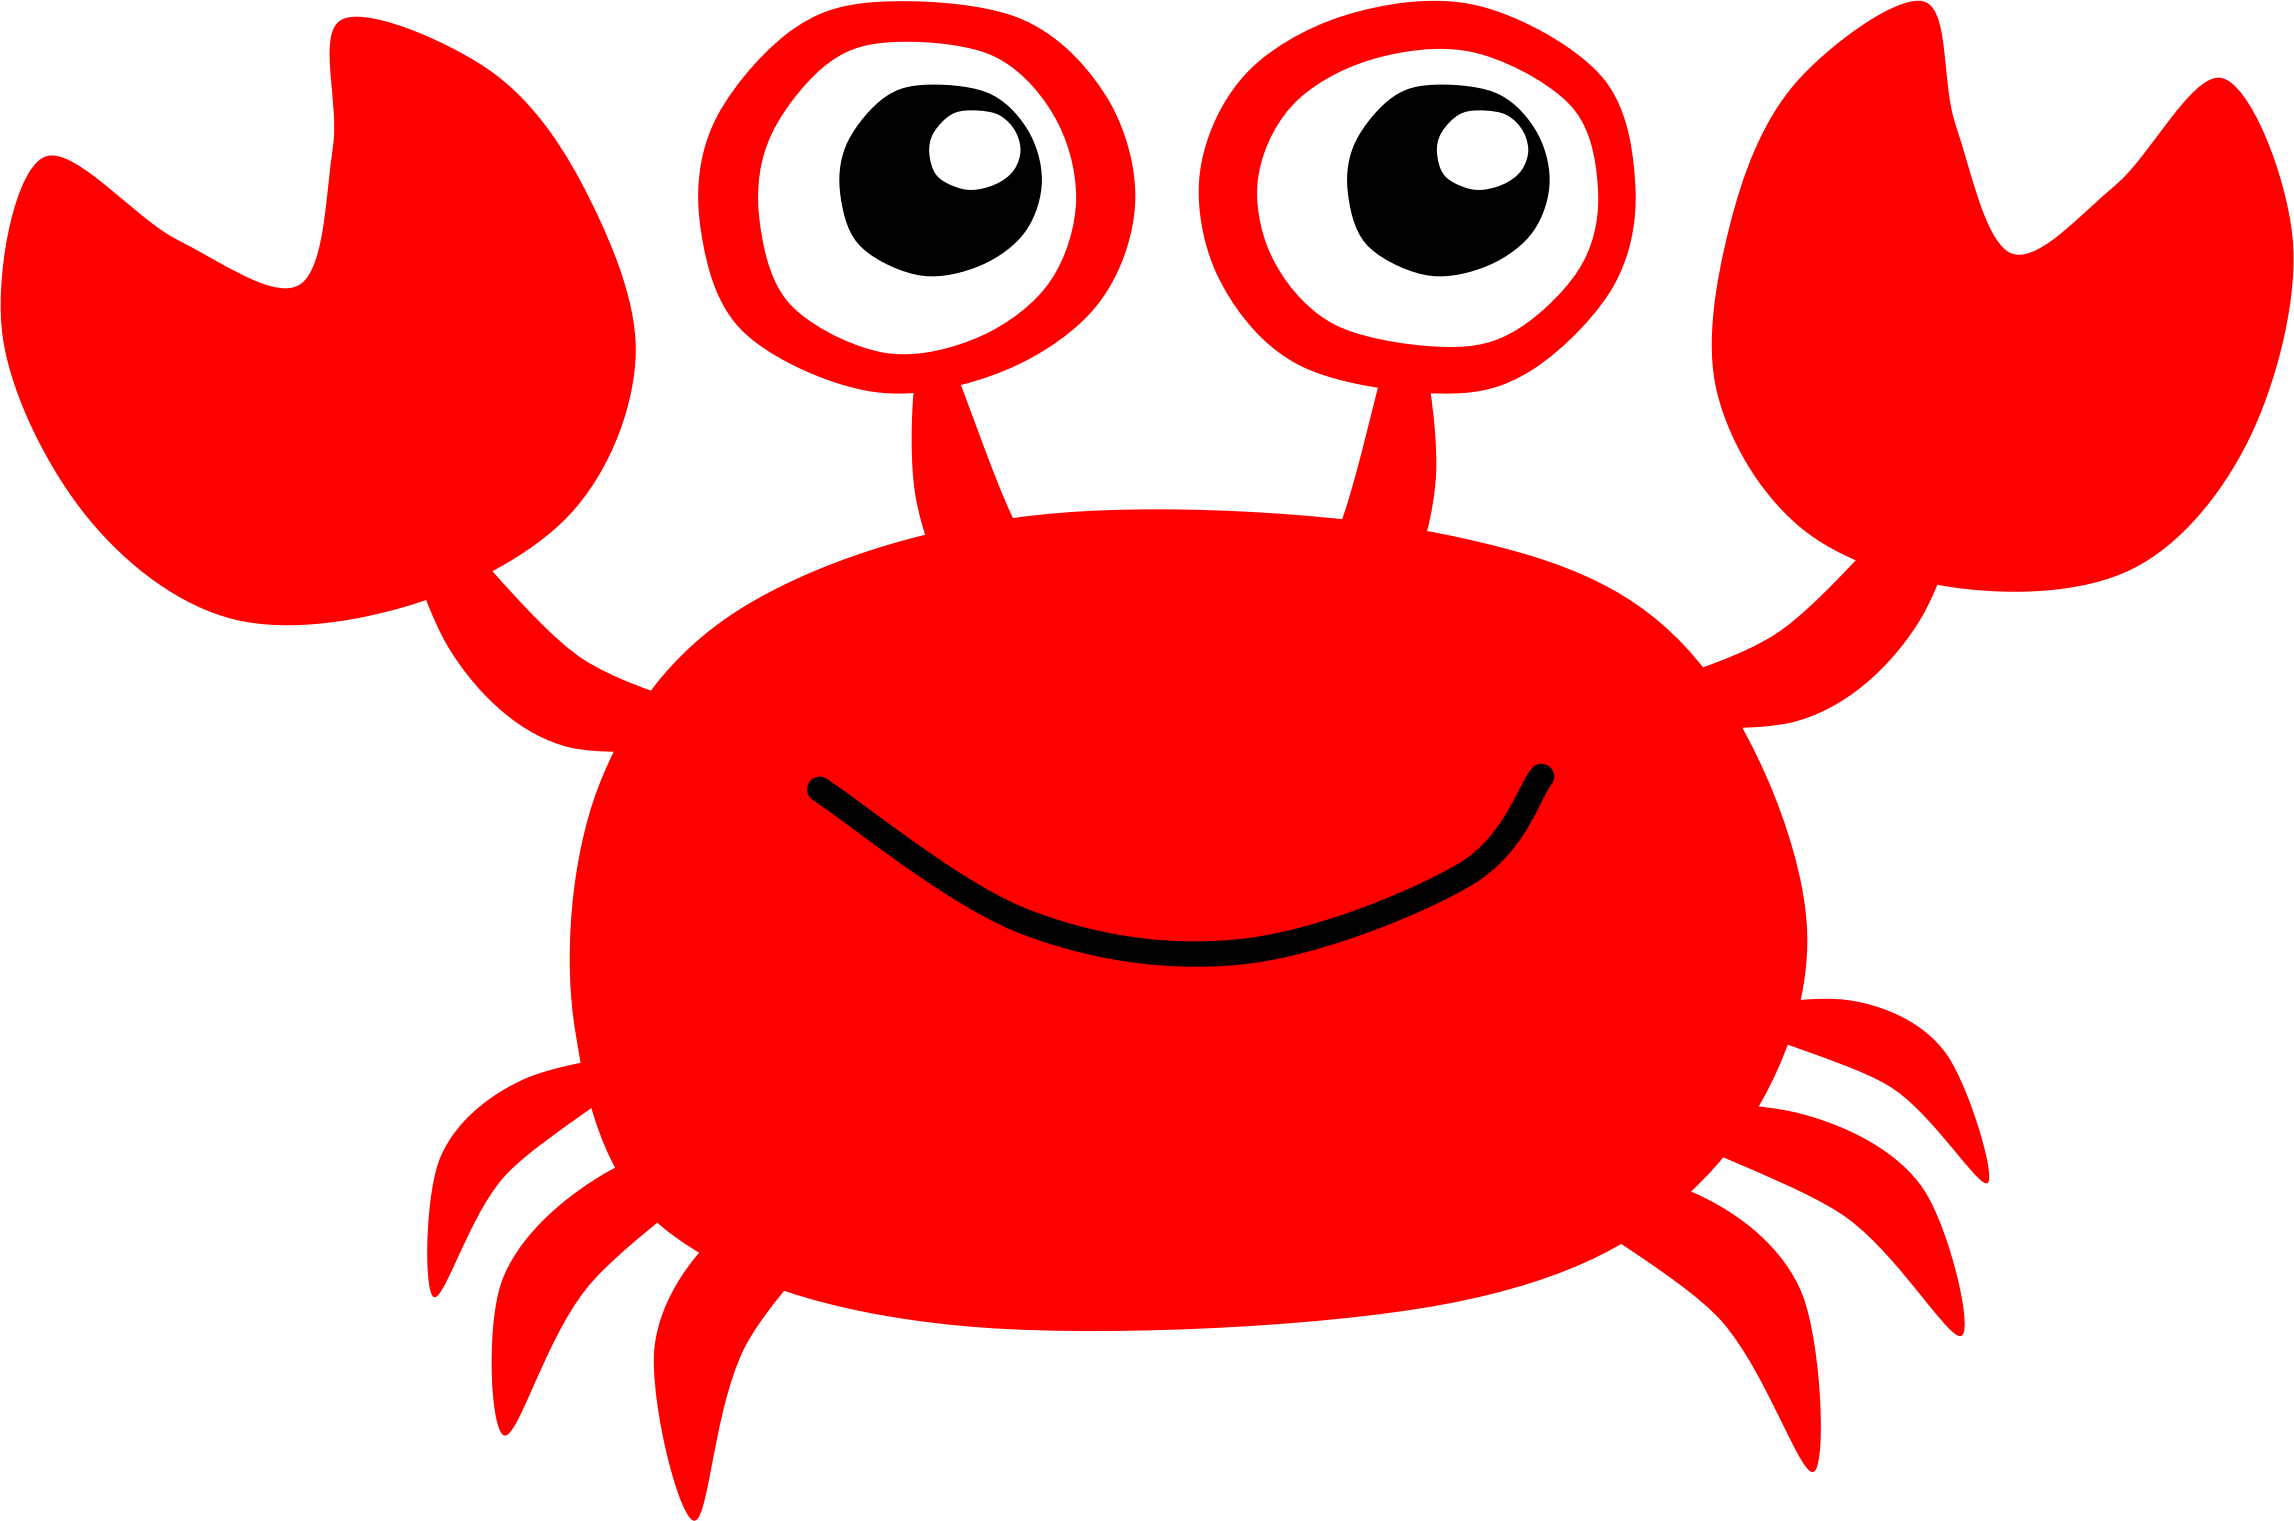 Crab drawing at getdrawings. Horseshoe clipart simple